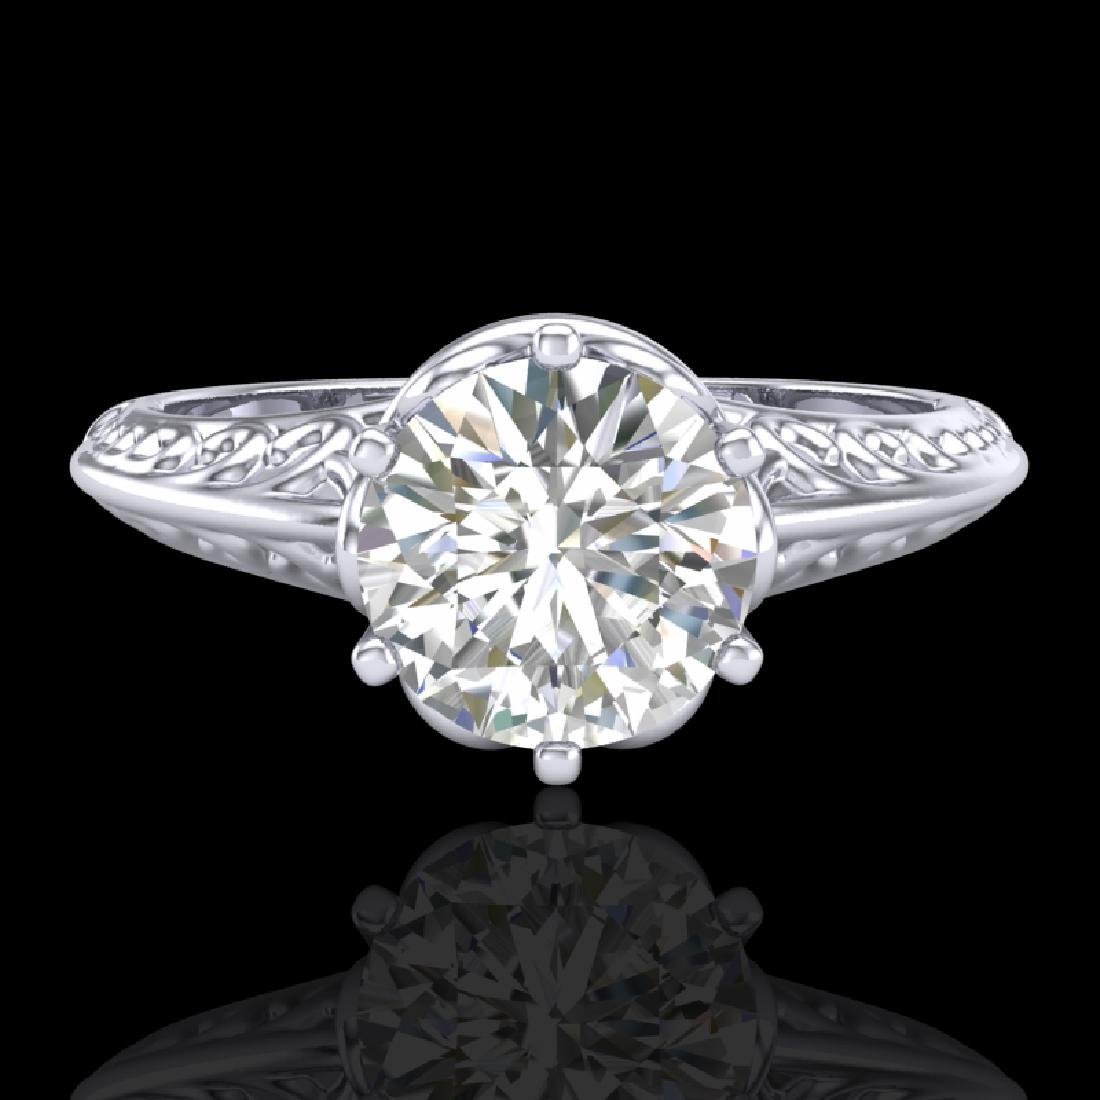 1 CTW VS/SI Diamond Art Deco Ring 18K White Gold - 2